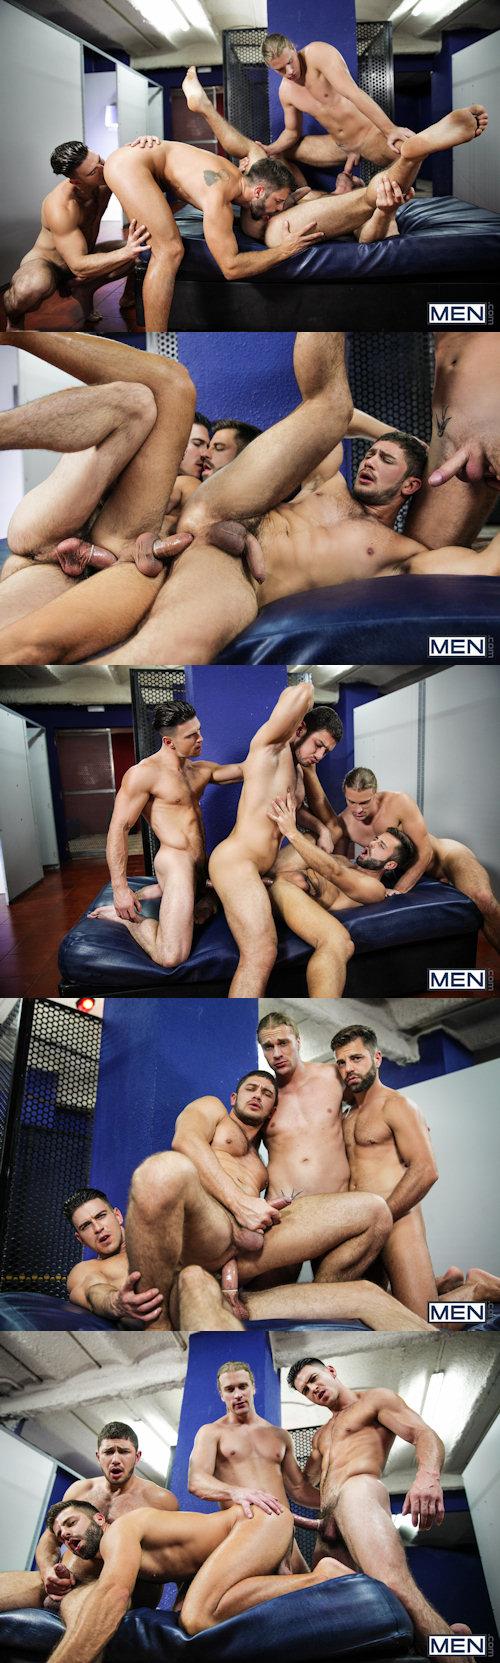 MEN-Paddy-OBrian-Dato-Foland-Hector-De-Silva-Johan-Kane-2.jpg